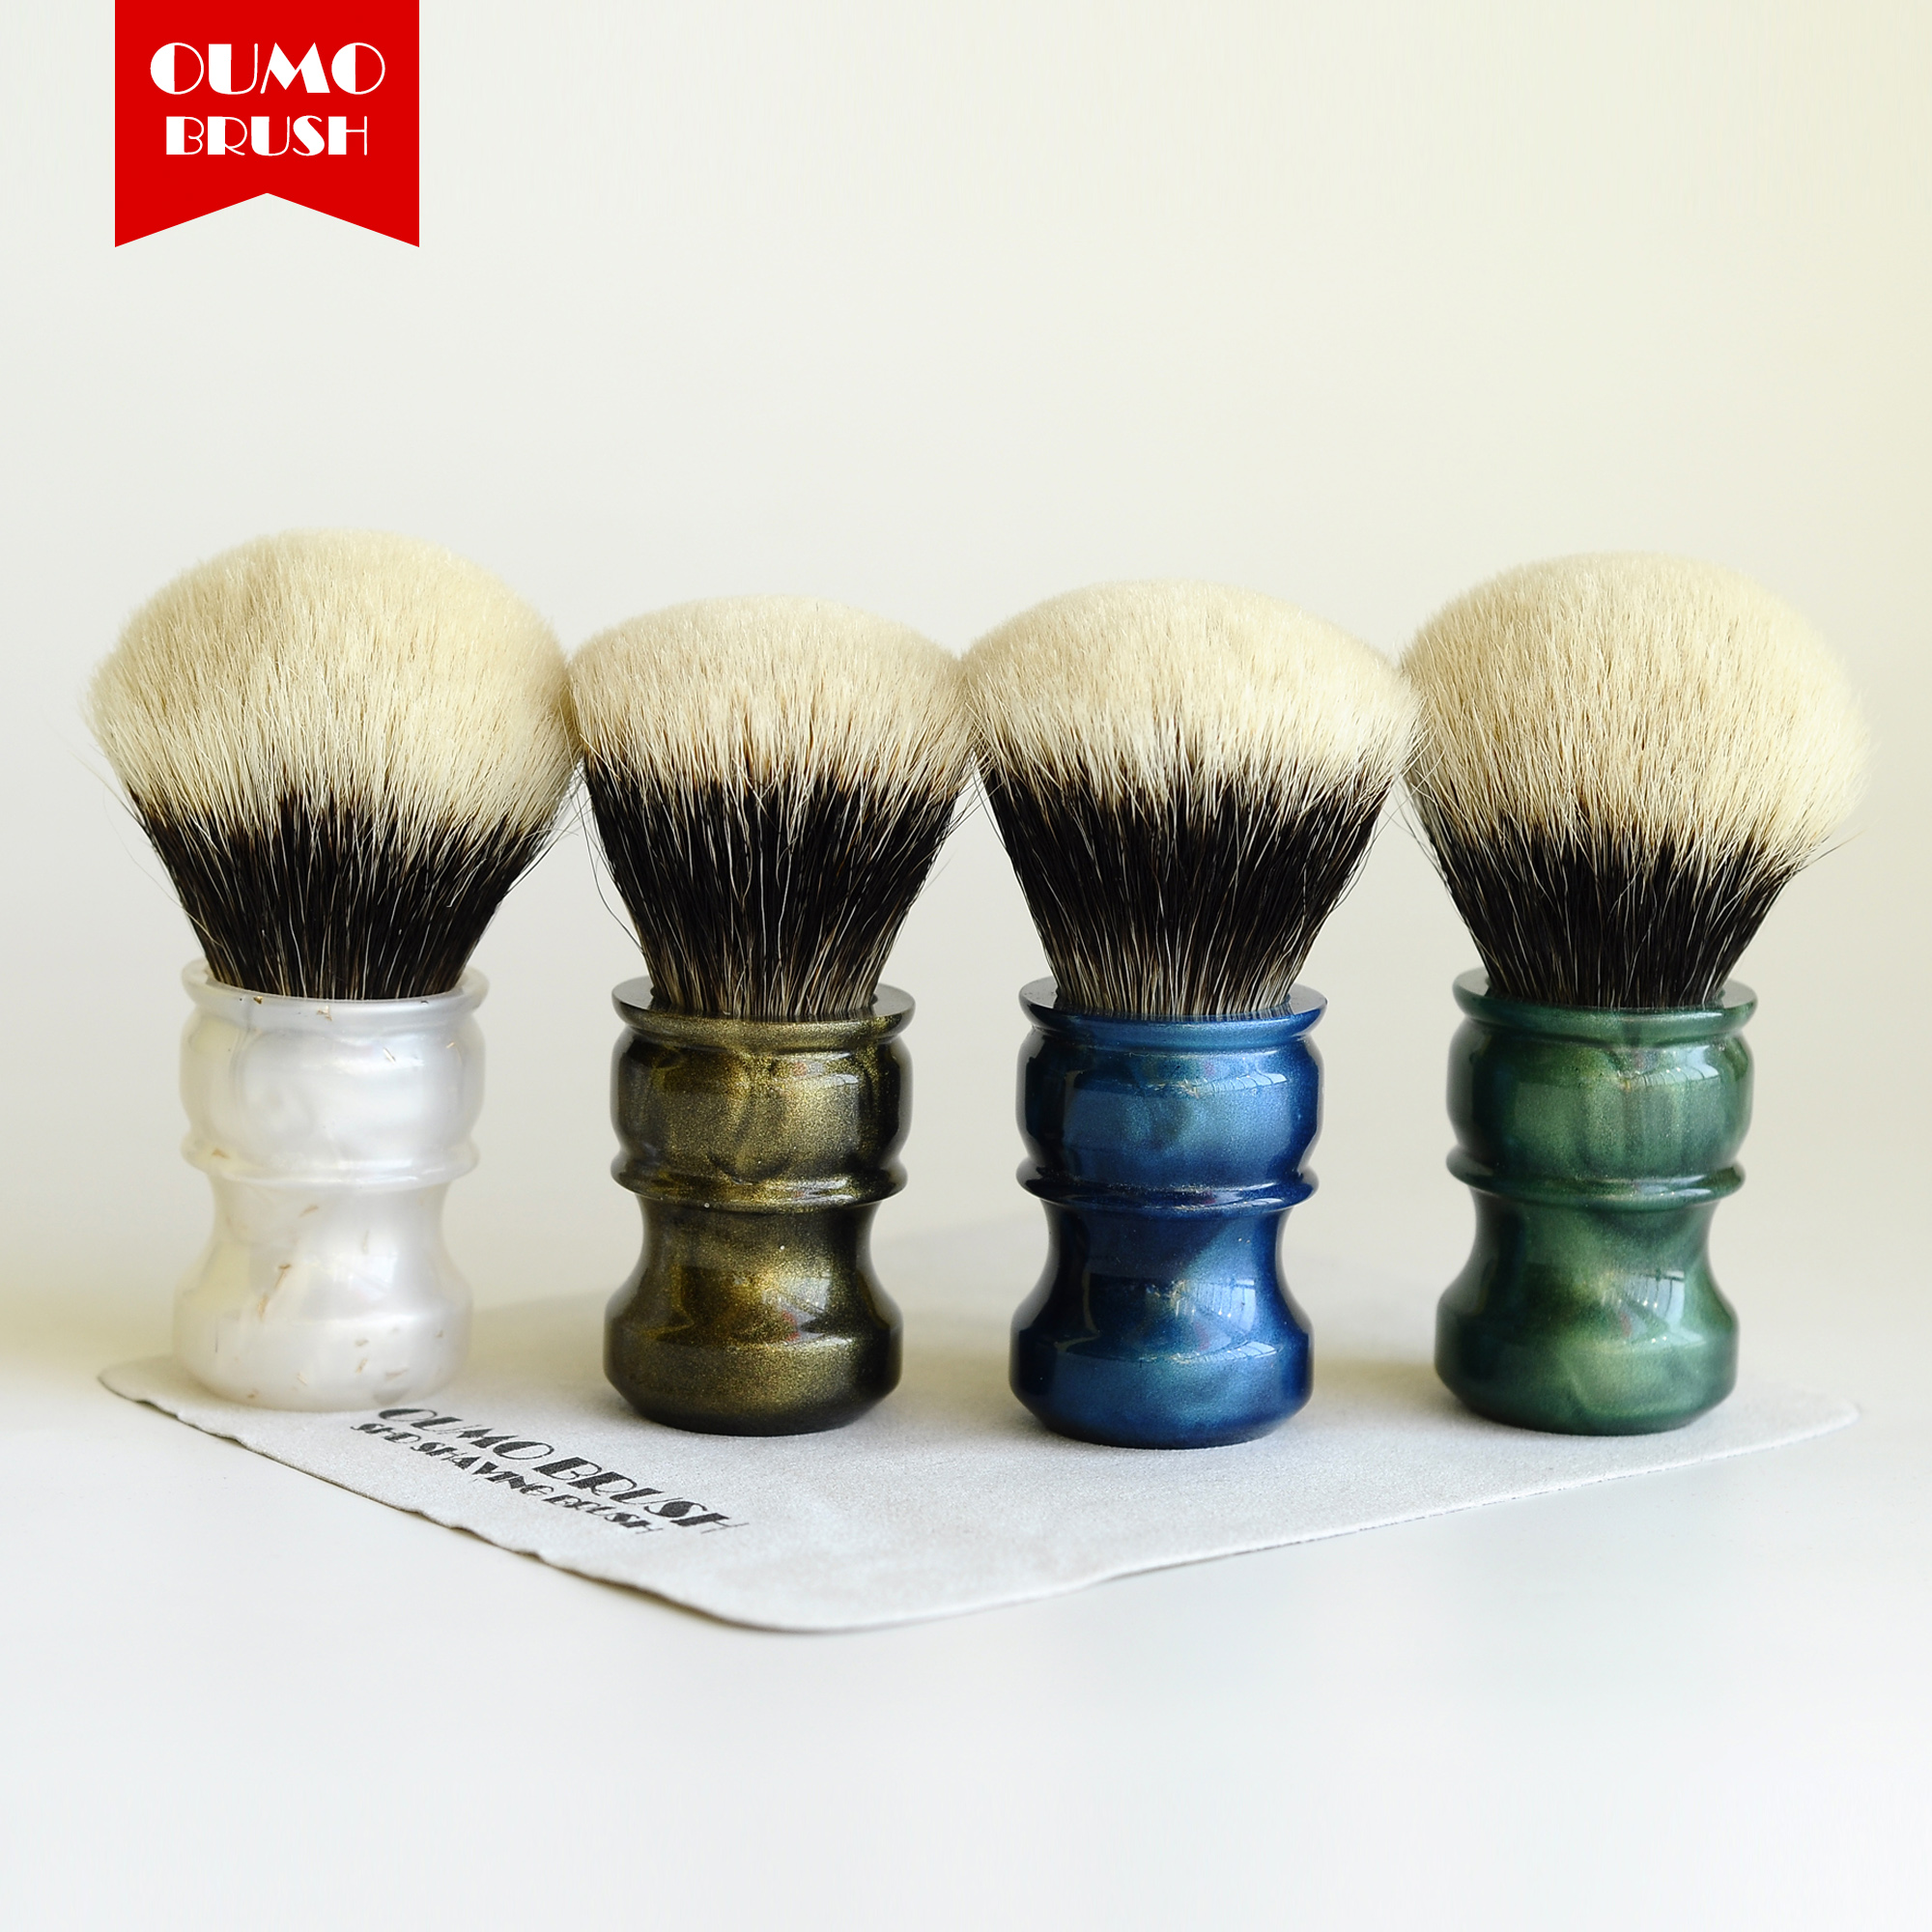 OUMO BRUSH-Fans Exclusive Limit Fan Handmaster Finest Badger Hair Knots Shaving Brush